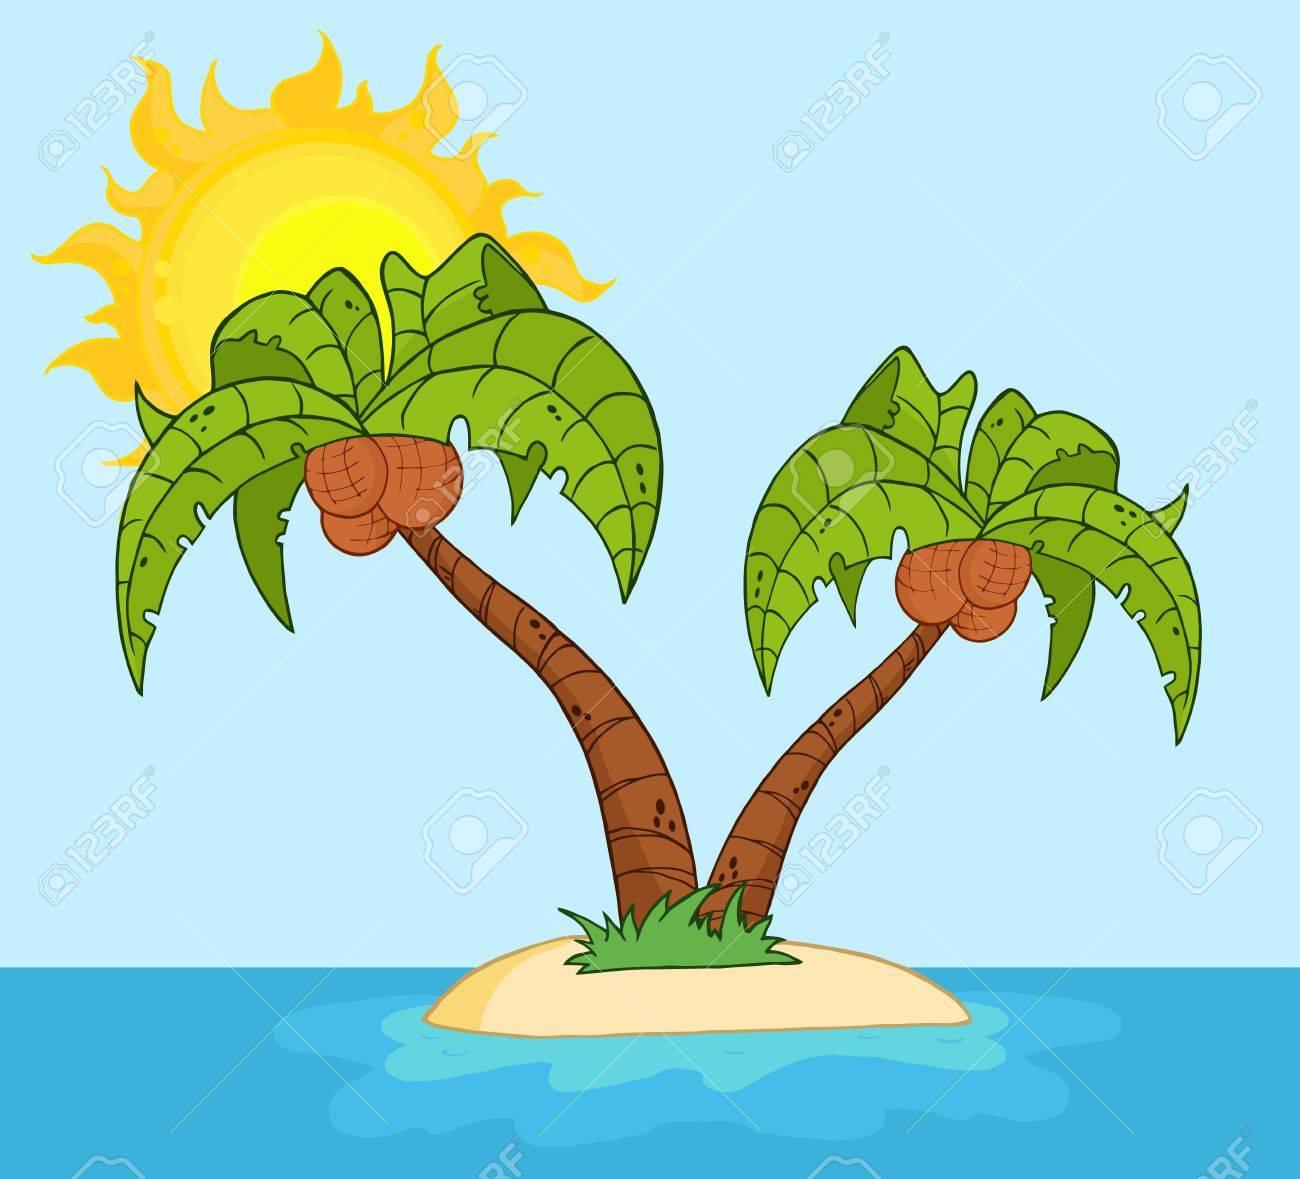 Cartoon Palm Tree Island Island With Two Palm Tree